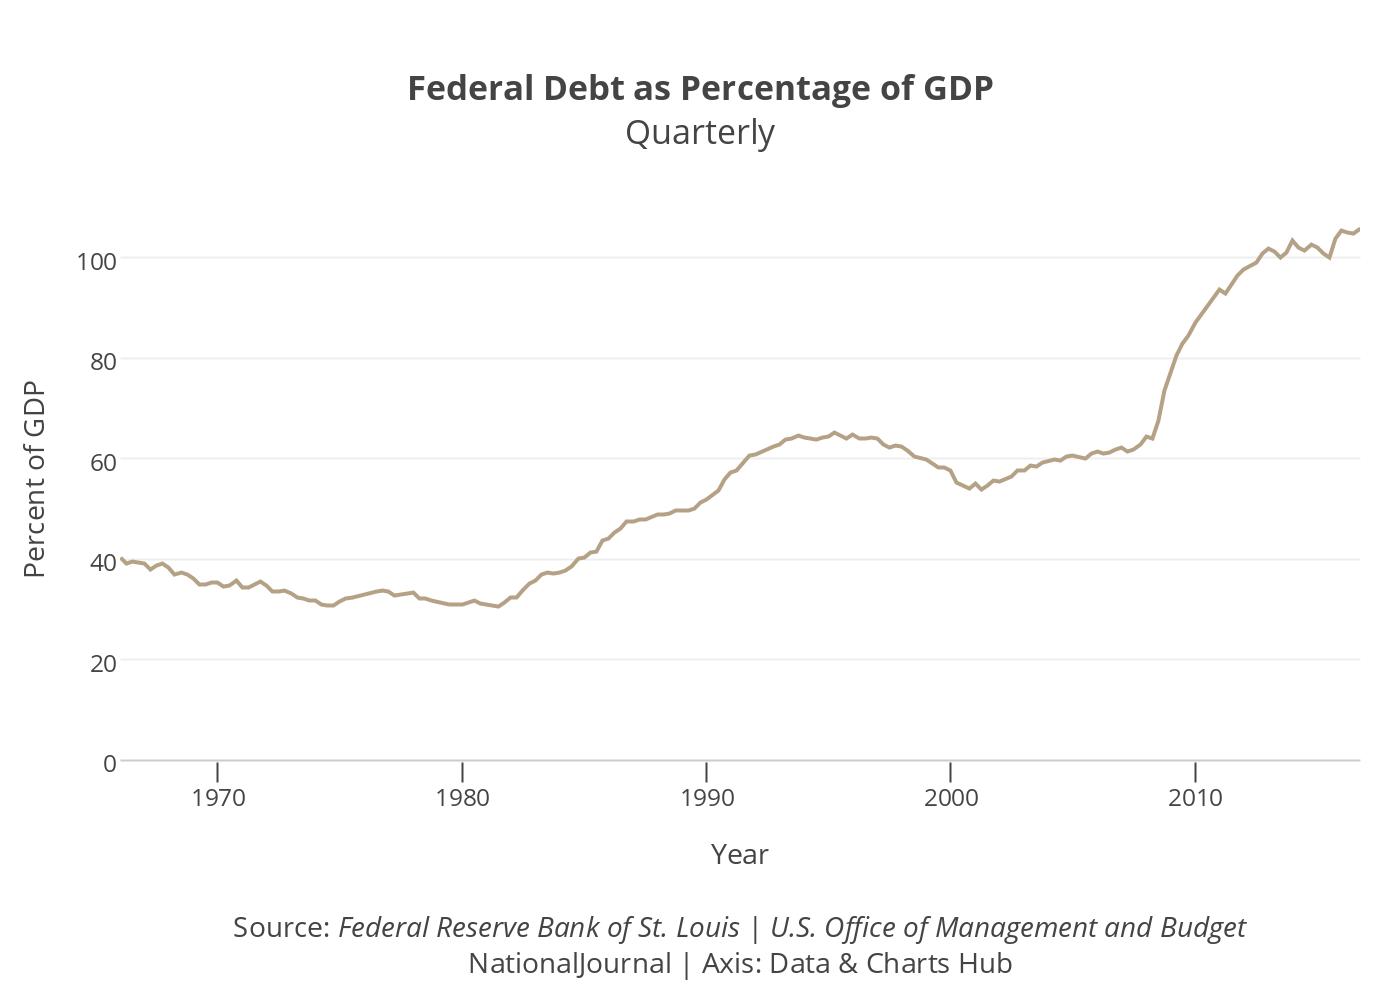 Federal Debt as Percentage of GDP